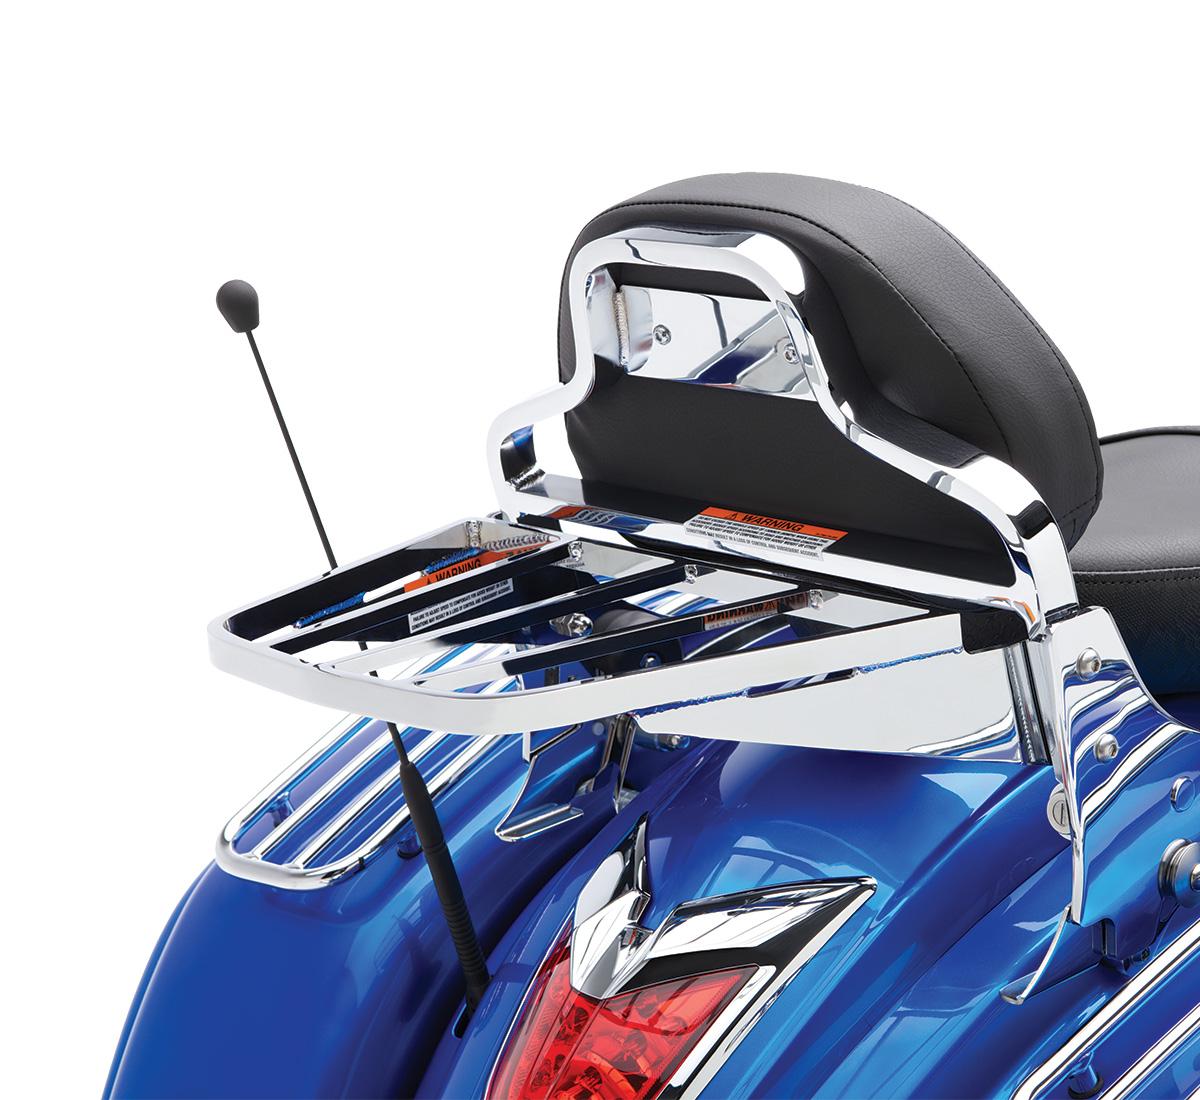 Kawasaki Vaquero Luggage Rack